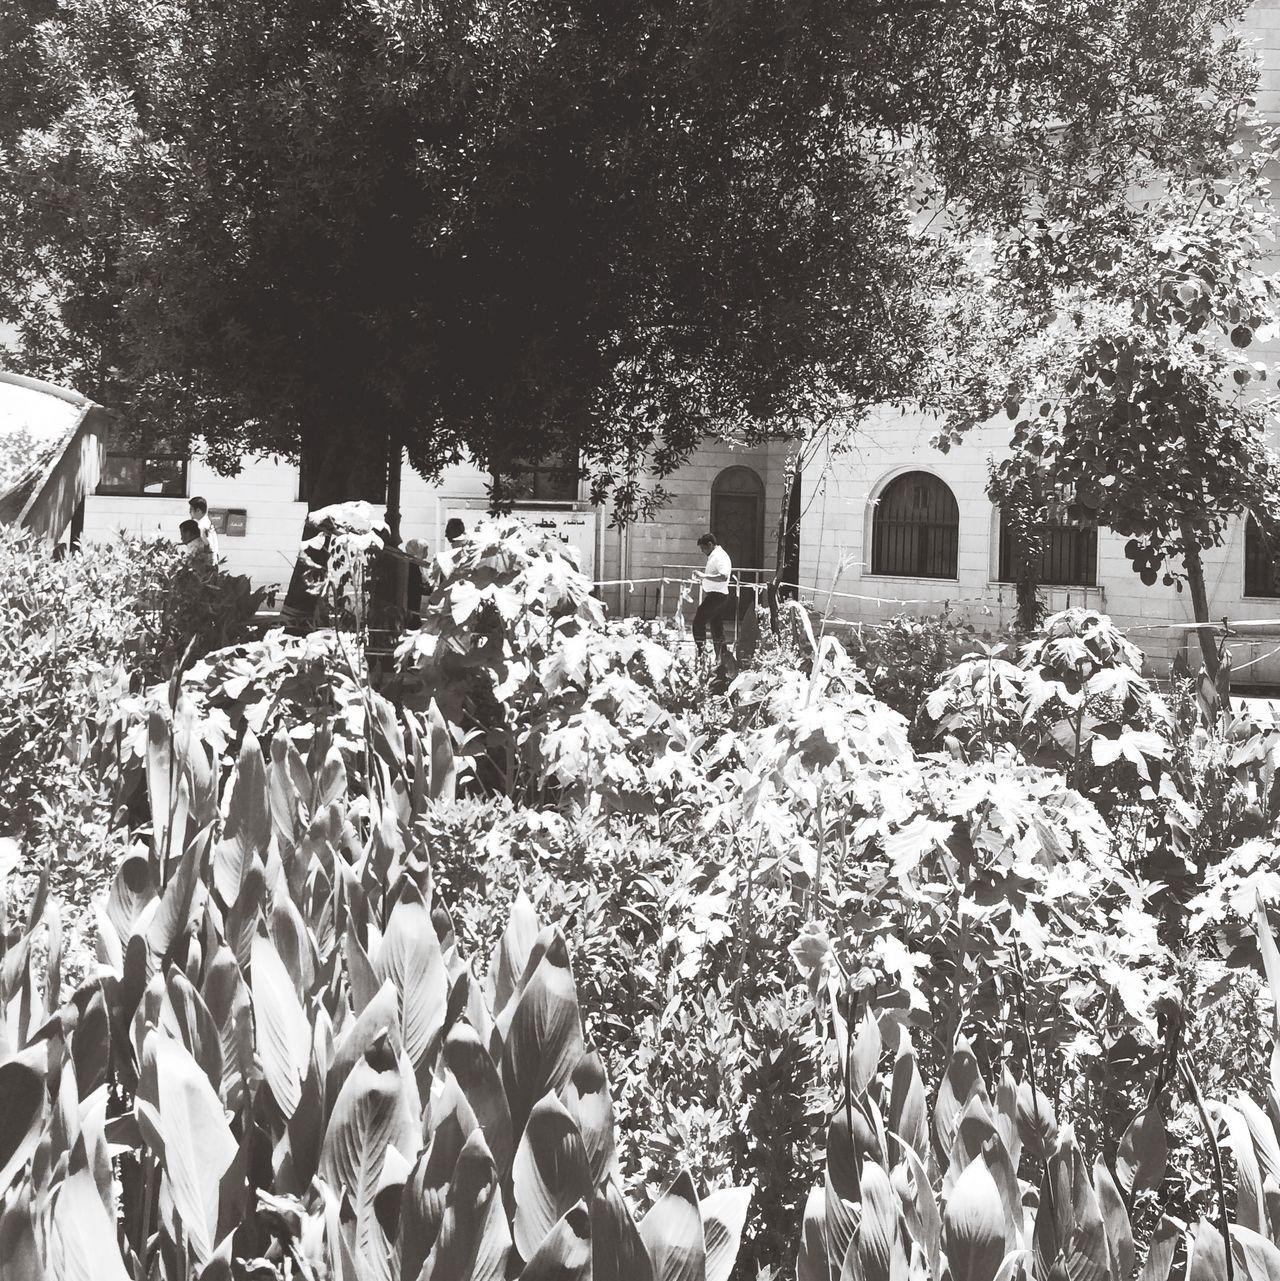 4_k @4pics_88 #follow #like #صورة #صور #تصوير #تصميمي #تصميم #عدستي #كانون #فولو #فولو_مي #فولومي #فن #طبيعه #ورد #اطفال#موضه #السعوديه #الكويت #اليمن #قطر #عمان #البحرين #الامارات#مصر #لبنان #سوريا #اربعه_صور #اربع_صور   My Photography سوق القديم Kuwait